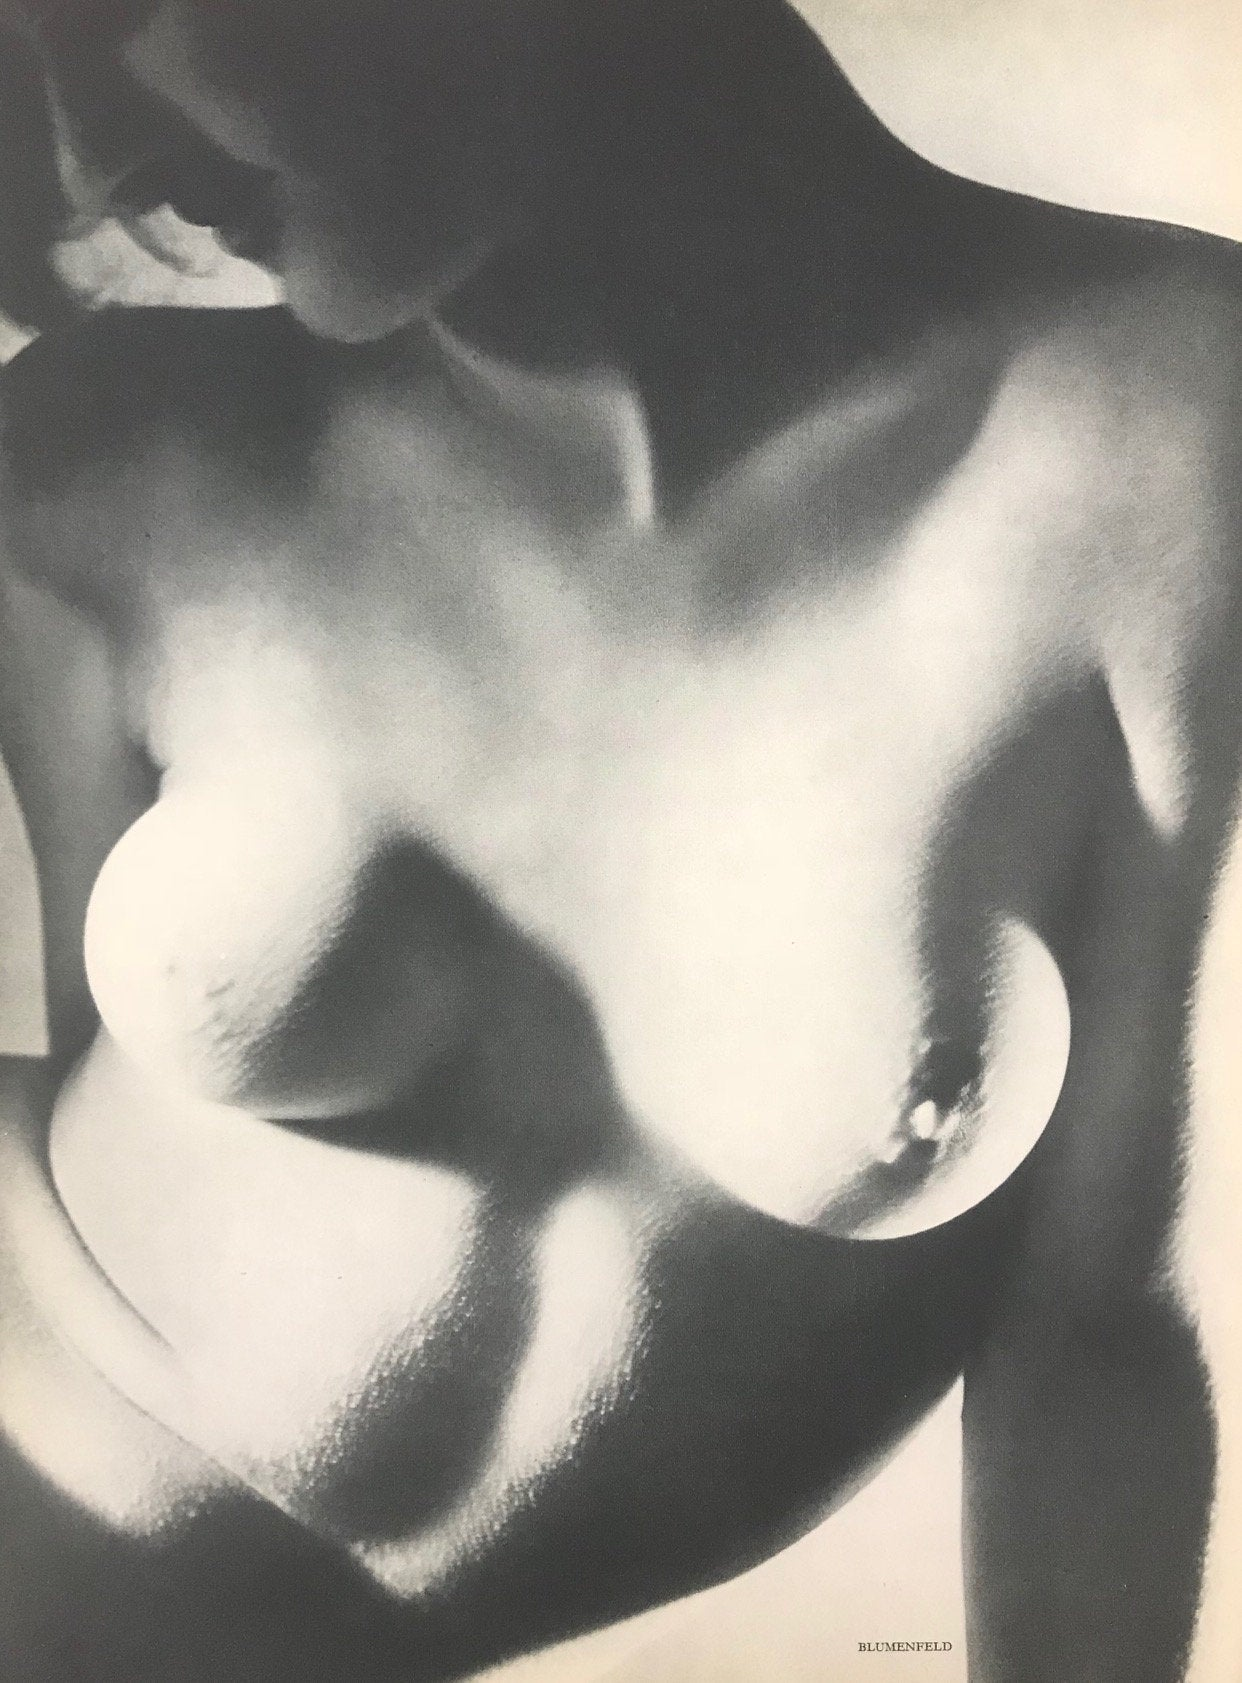 Erwin Blumenfeld 2, Nude photograph printed 1938 for Verve